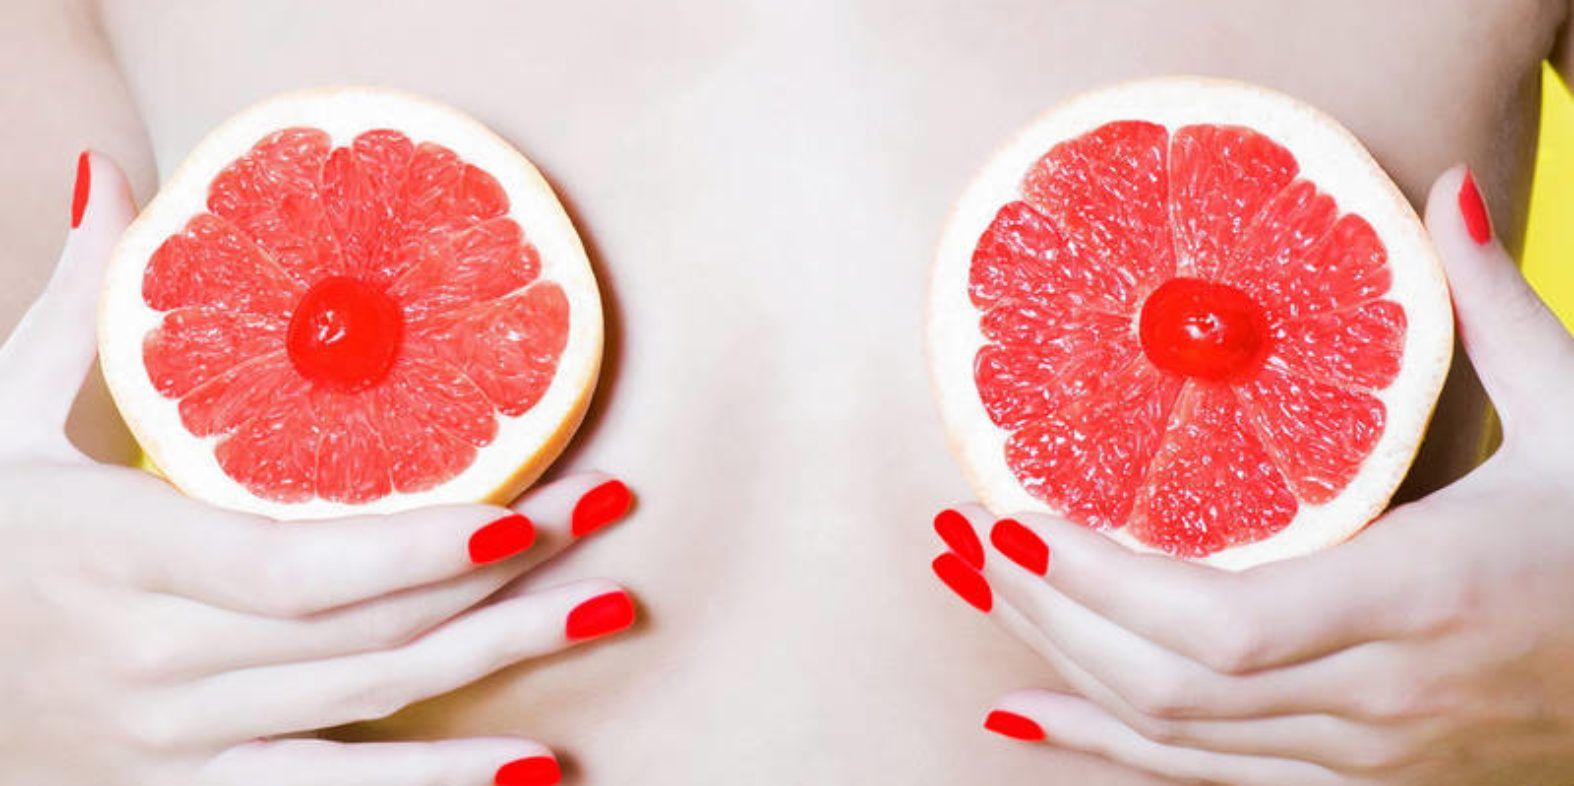 женская грудь грейпфрут